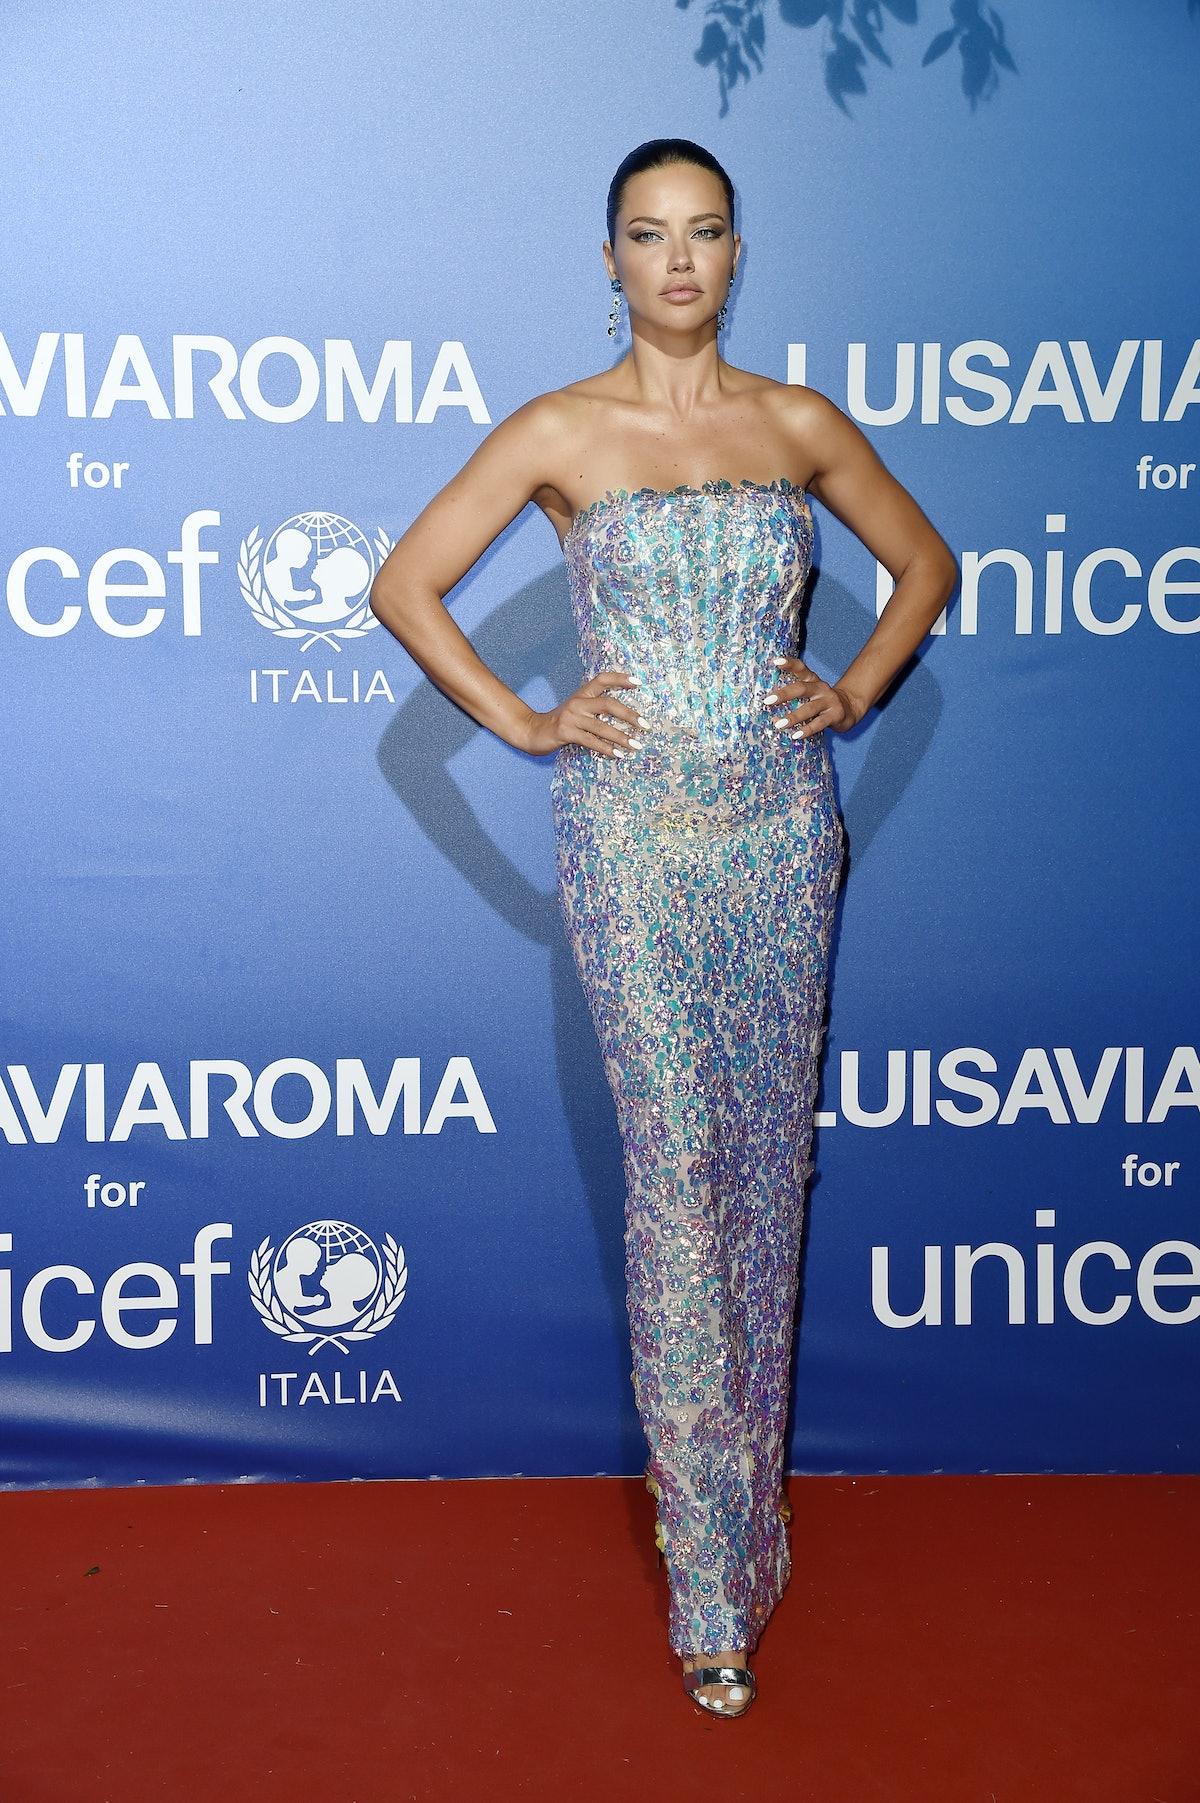 Unicef Summer Gala Presented by Luisaviaroma – Photocall